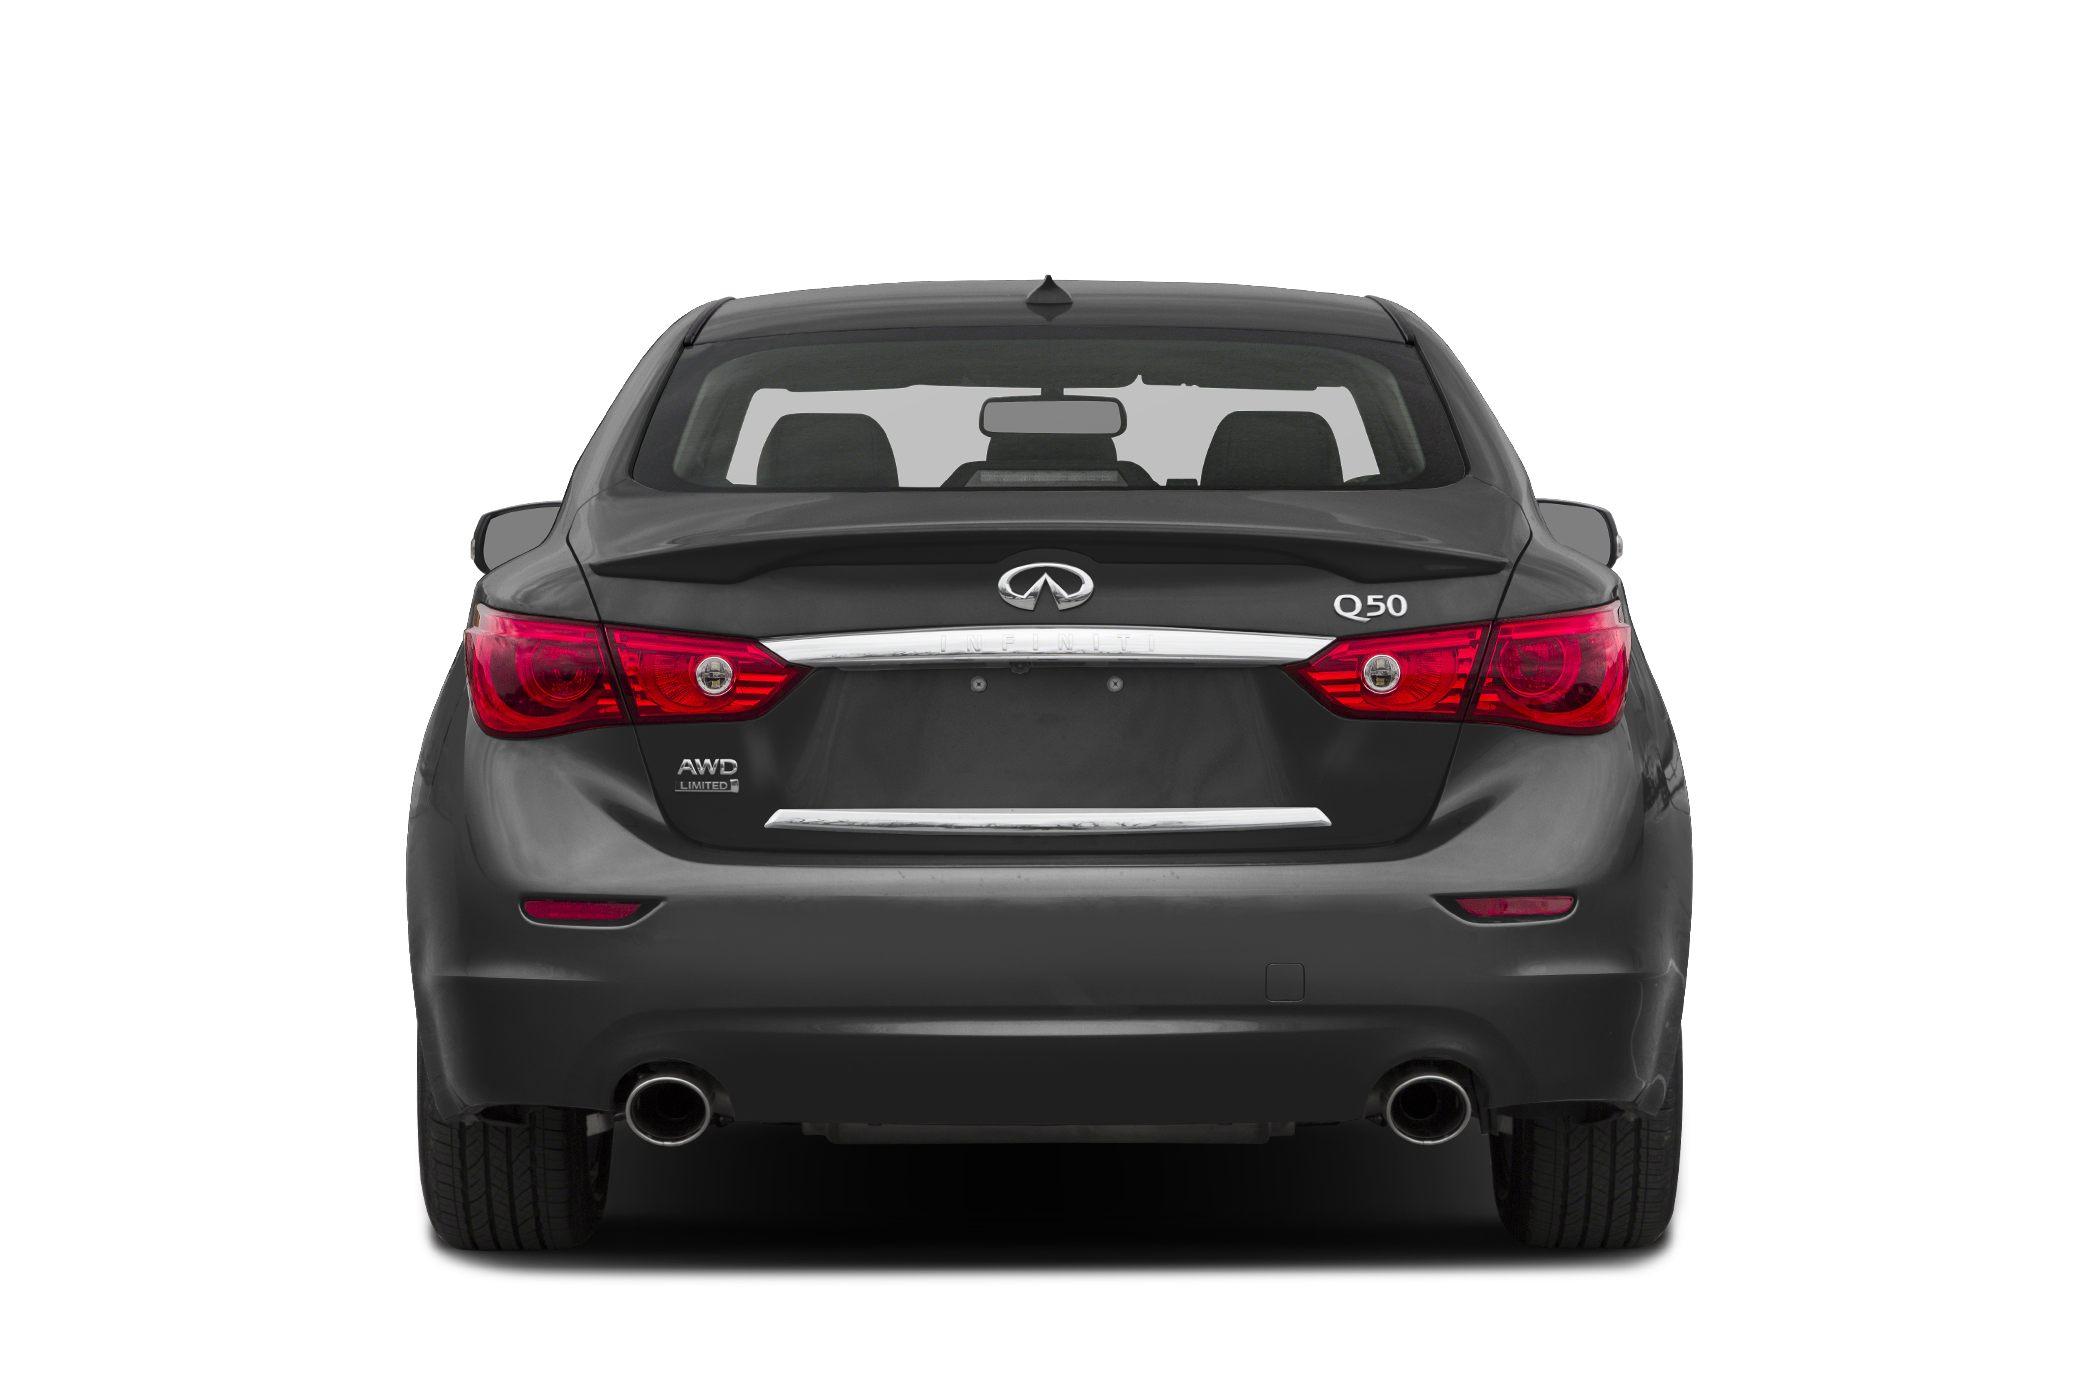 2017 INFINITI Q50 Reviews, Specs and Prices | Cars.com